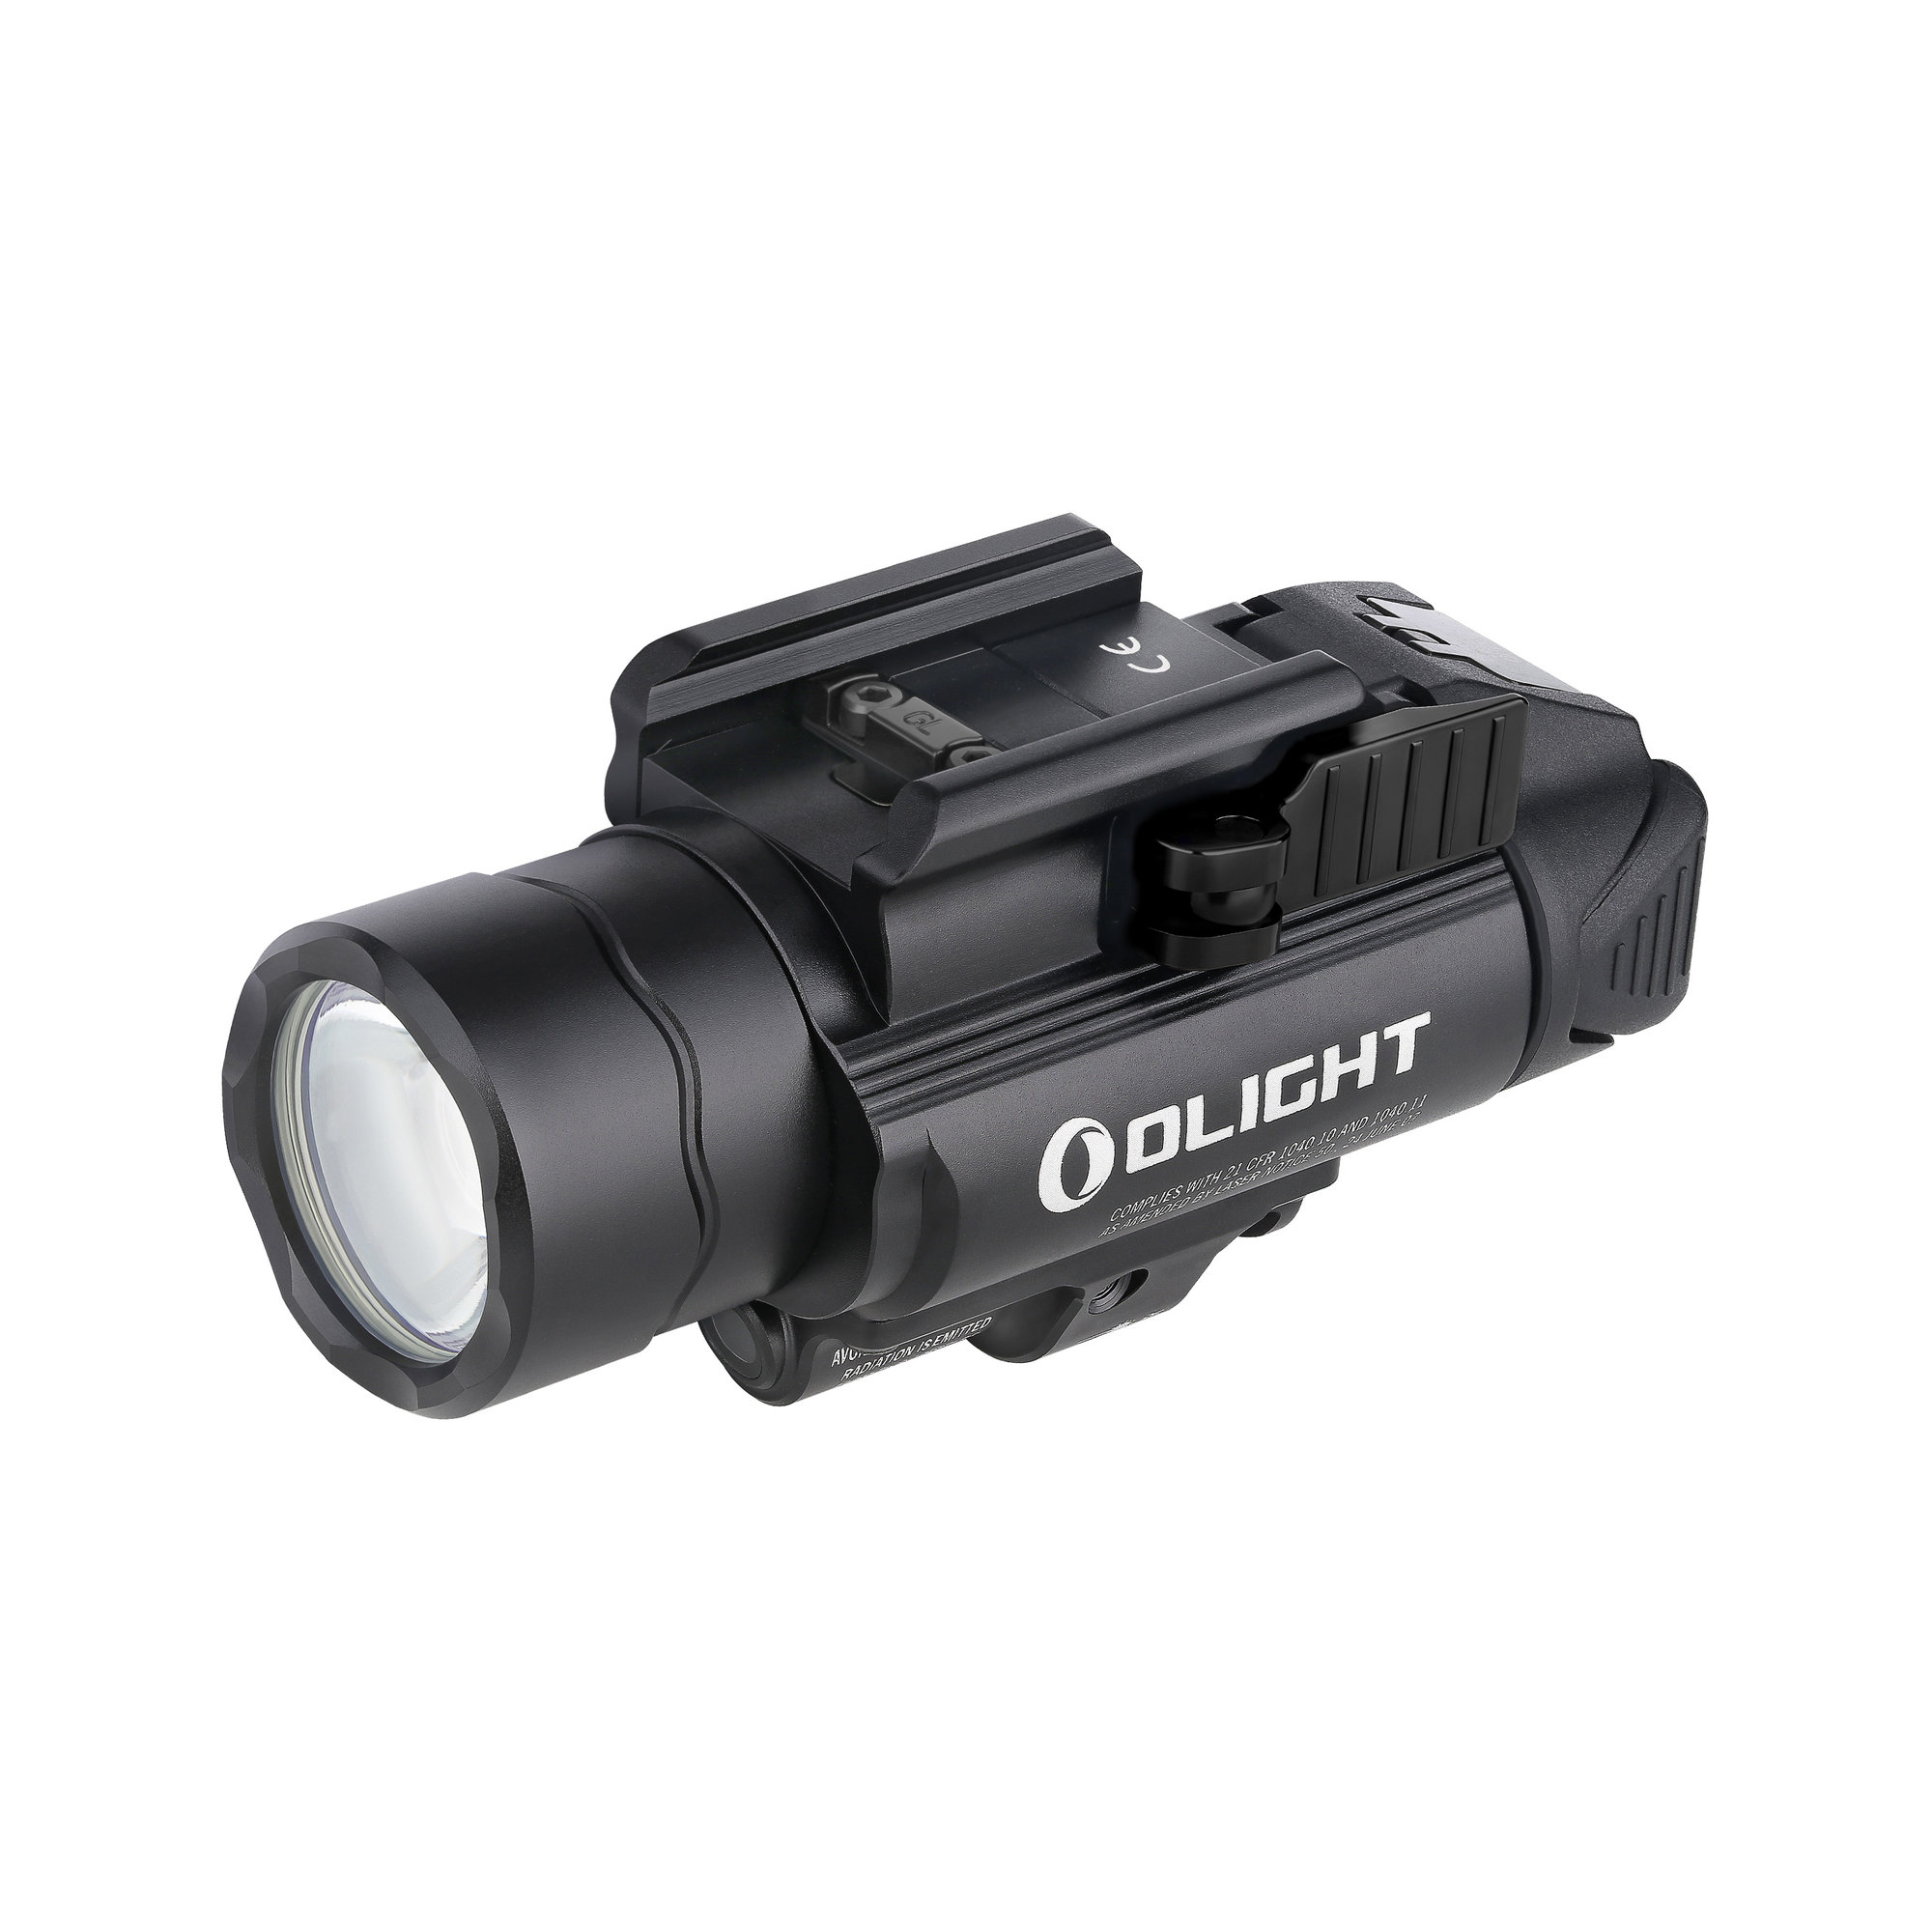 Svetlo na zbraň Olight BALDR IR 1350 lm - IR zelený laser